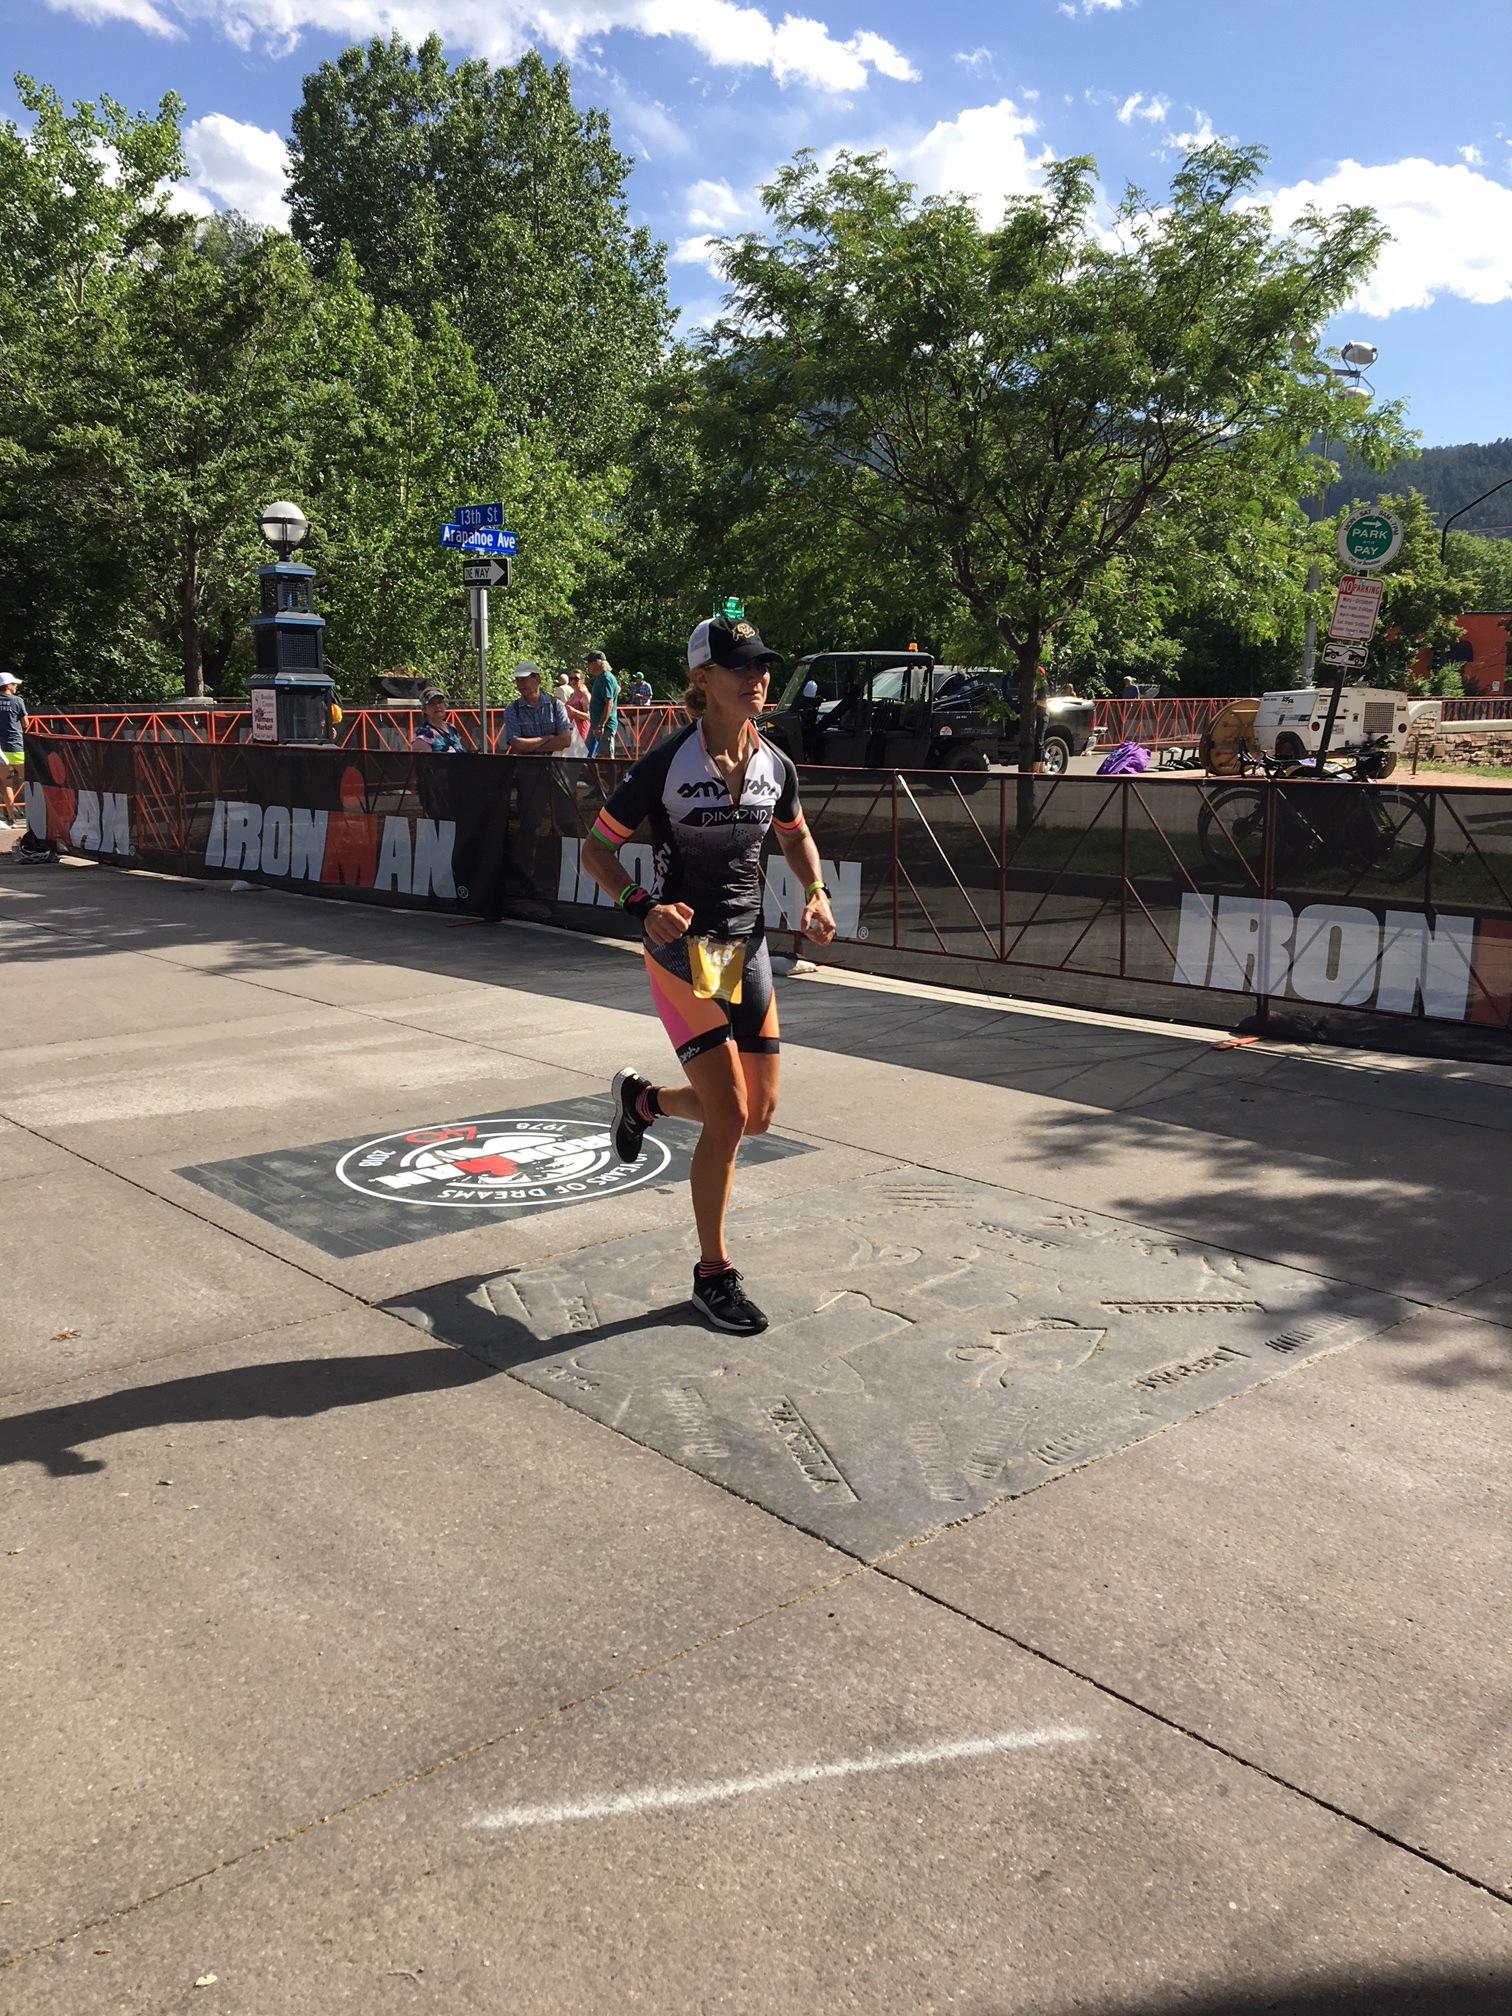 Feeling emotional at the finish.